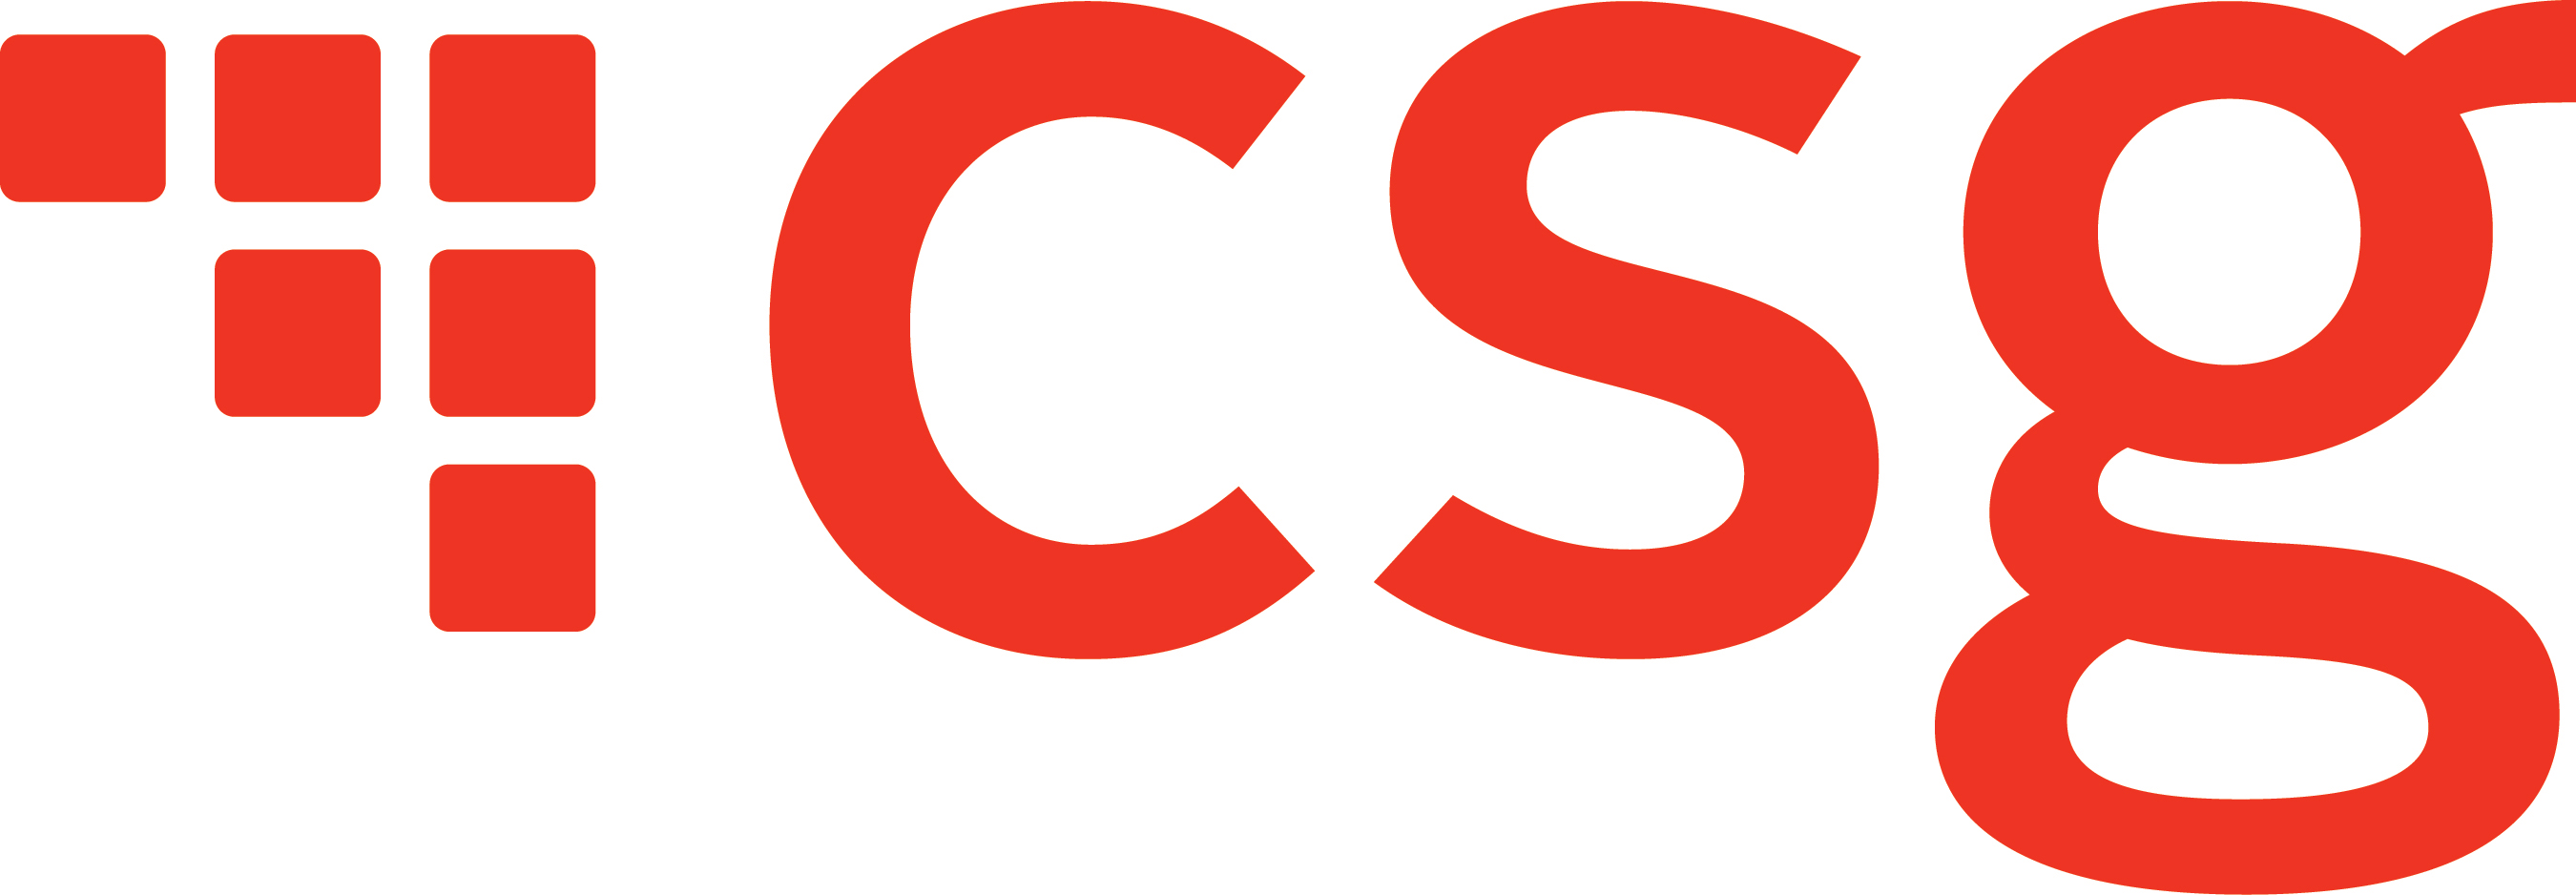 CSG Enhances ZEE5s Data Ecosystem for Next Era of Personalized Cross-Channel Entertainment Experiences